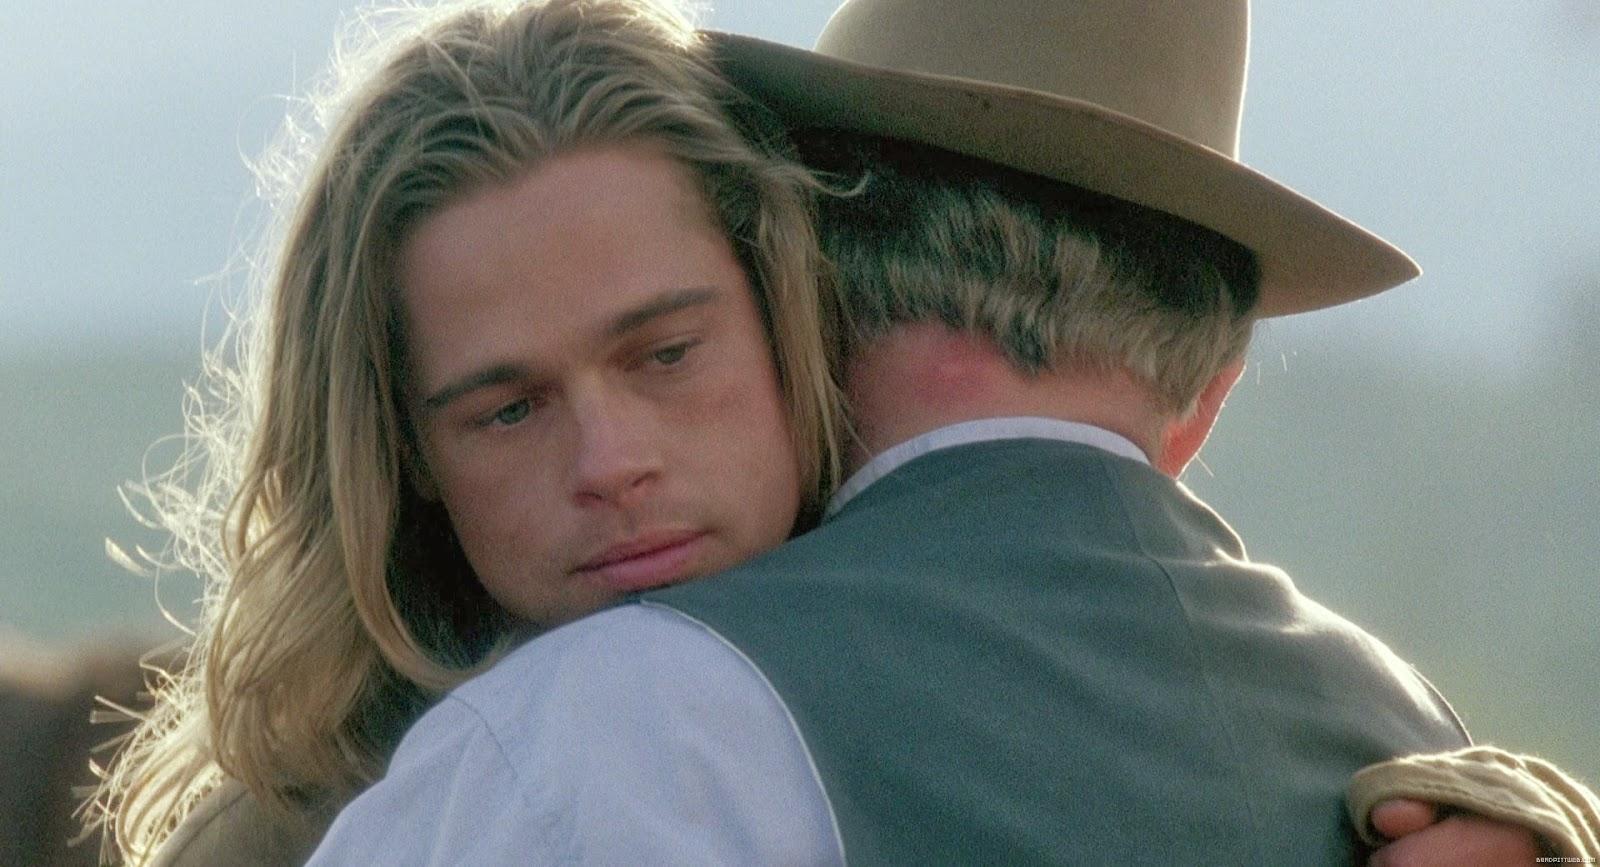 Legends of the Fall - 1994 Movie - Photo Gallery | Brad ... Brad Pitt And Angelina Jolie